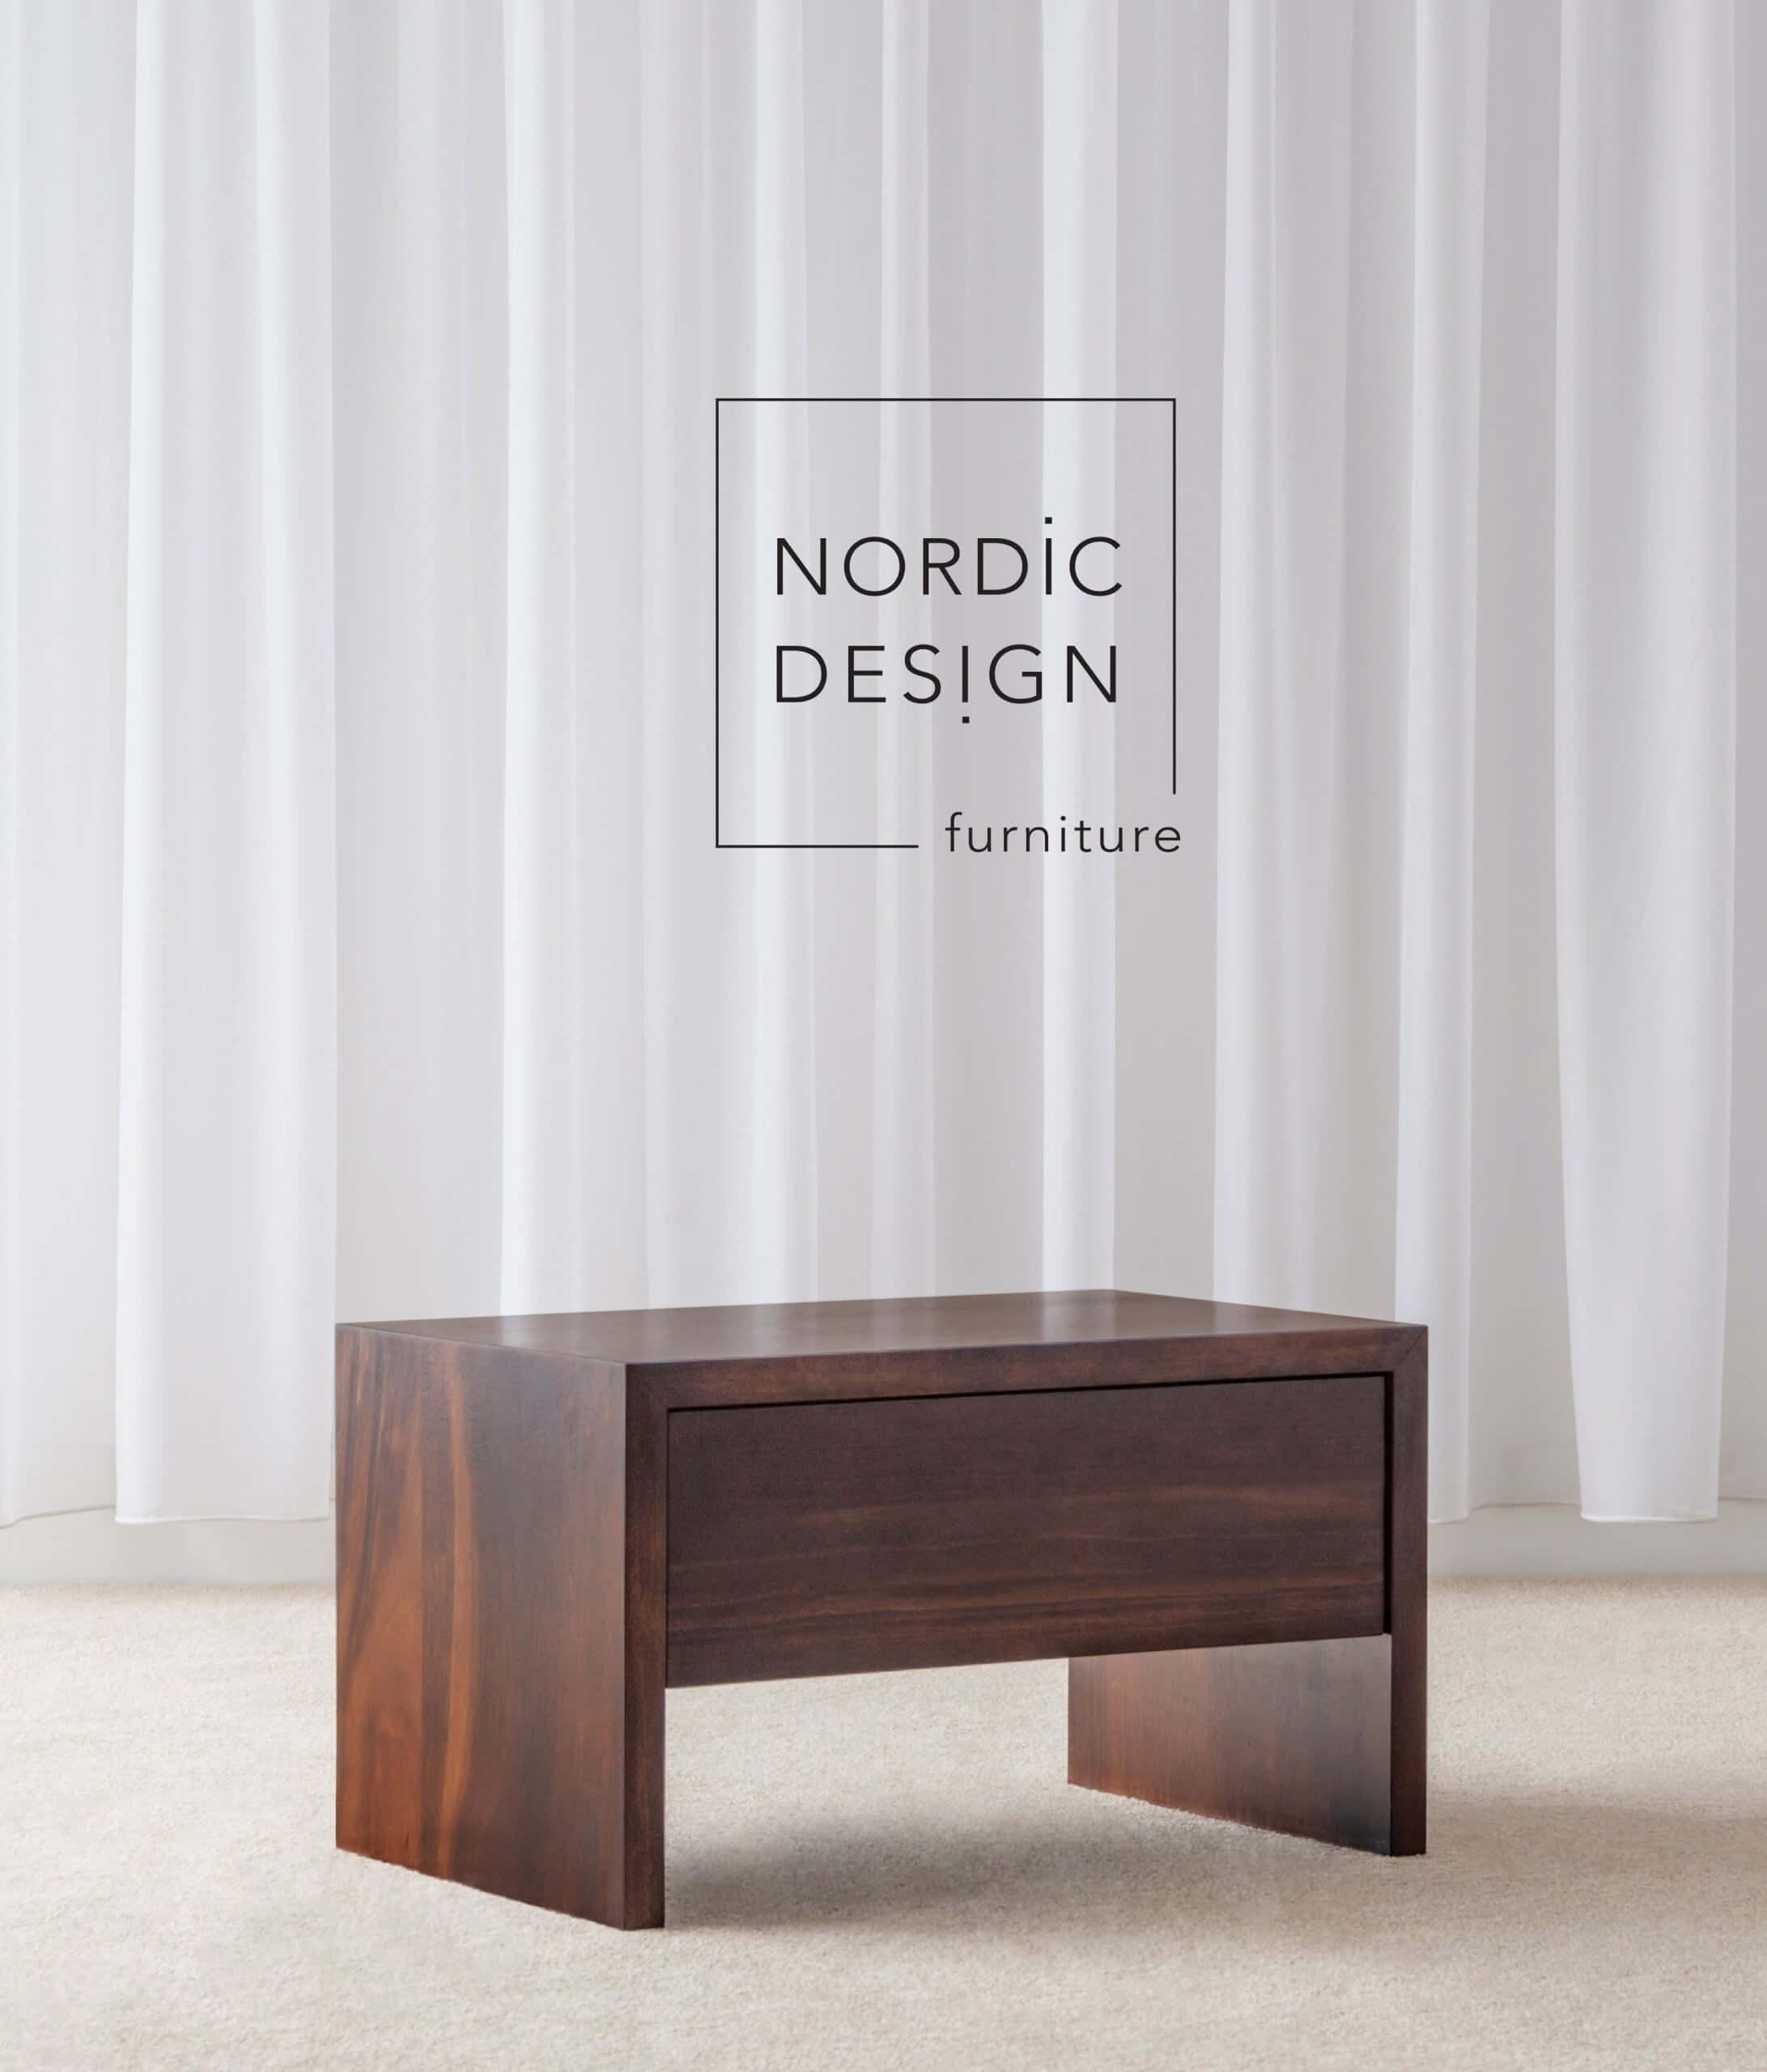 Custom timber bedside tables